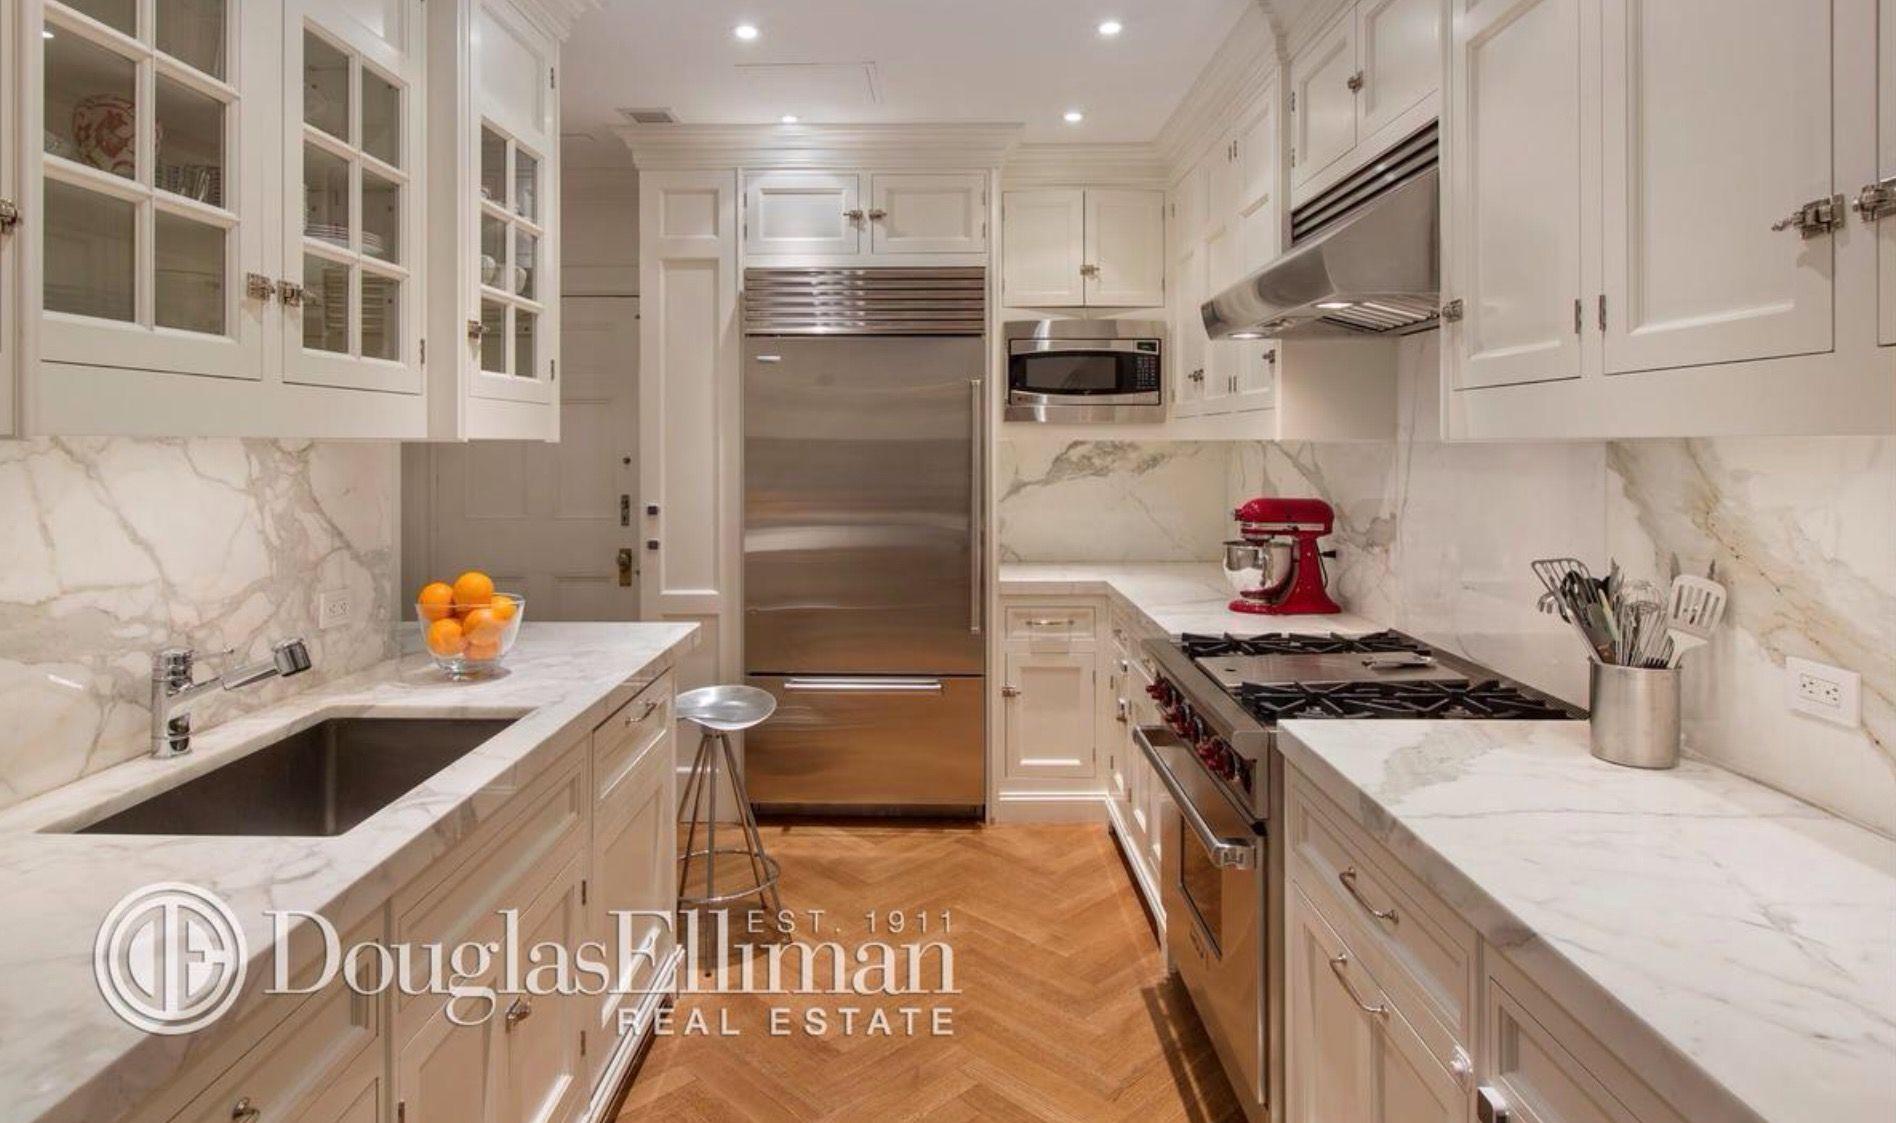 Captivating Renovated Kitchen, Master Bathroom, New York City, Manhattan, Kitchen  Designs, New York, Master Bathrooms, Bathroom, Updated Kitchen